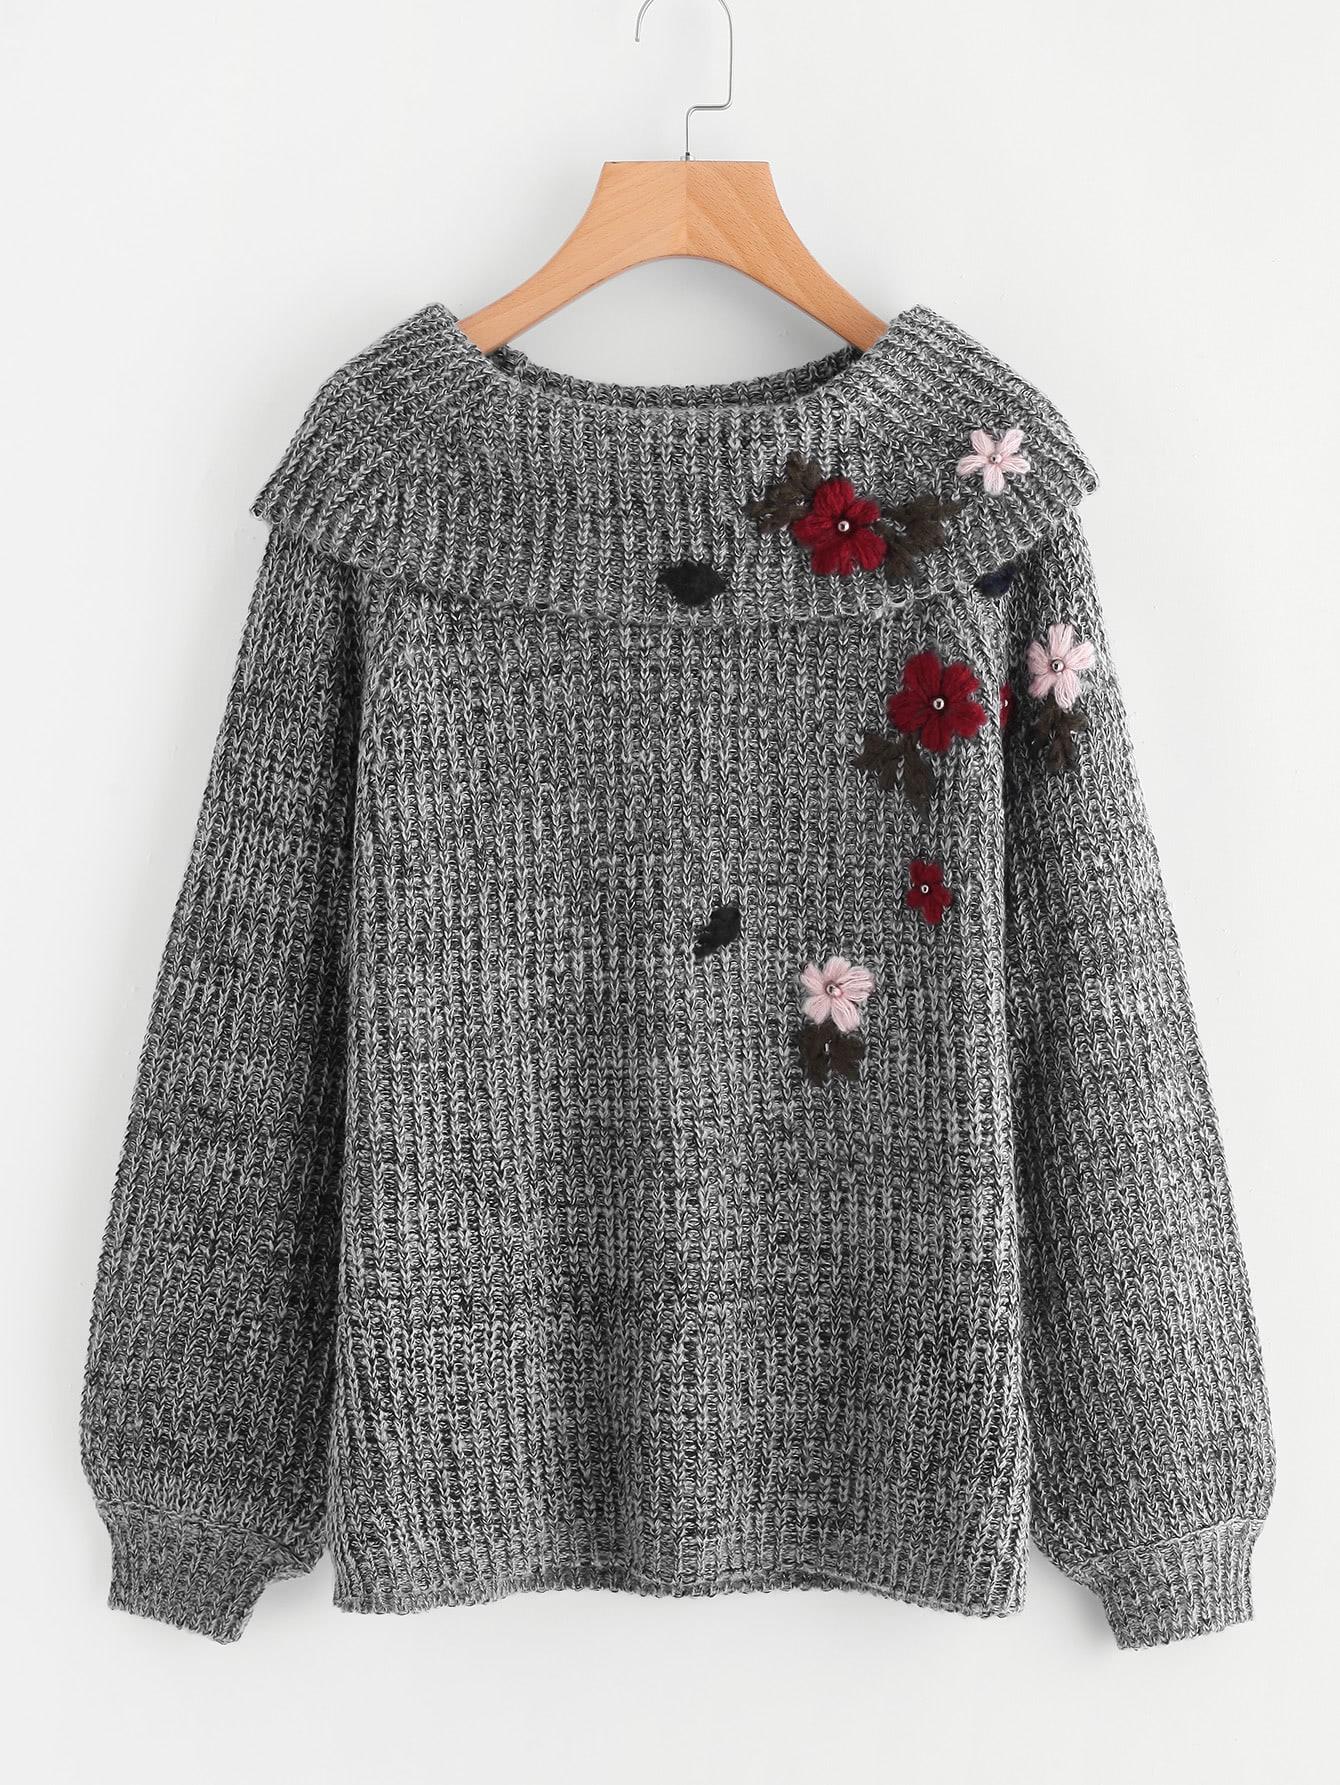 Foldover Neck Flower Embroidered Distressed Jumper girls spot embroidered sleeveless jumper